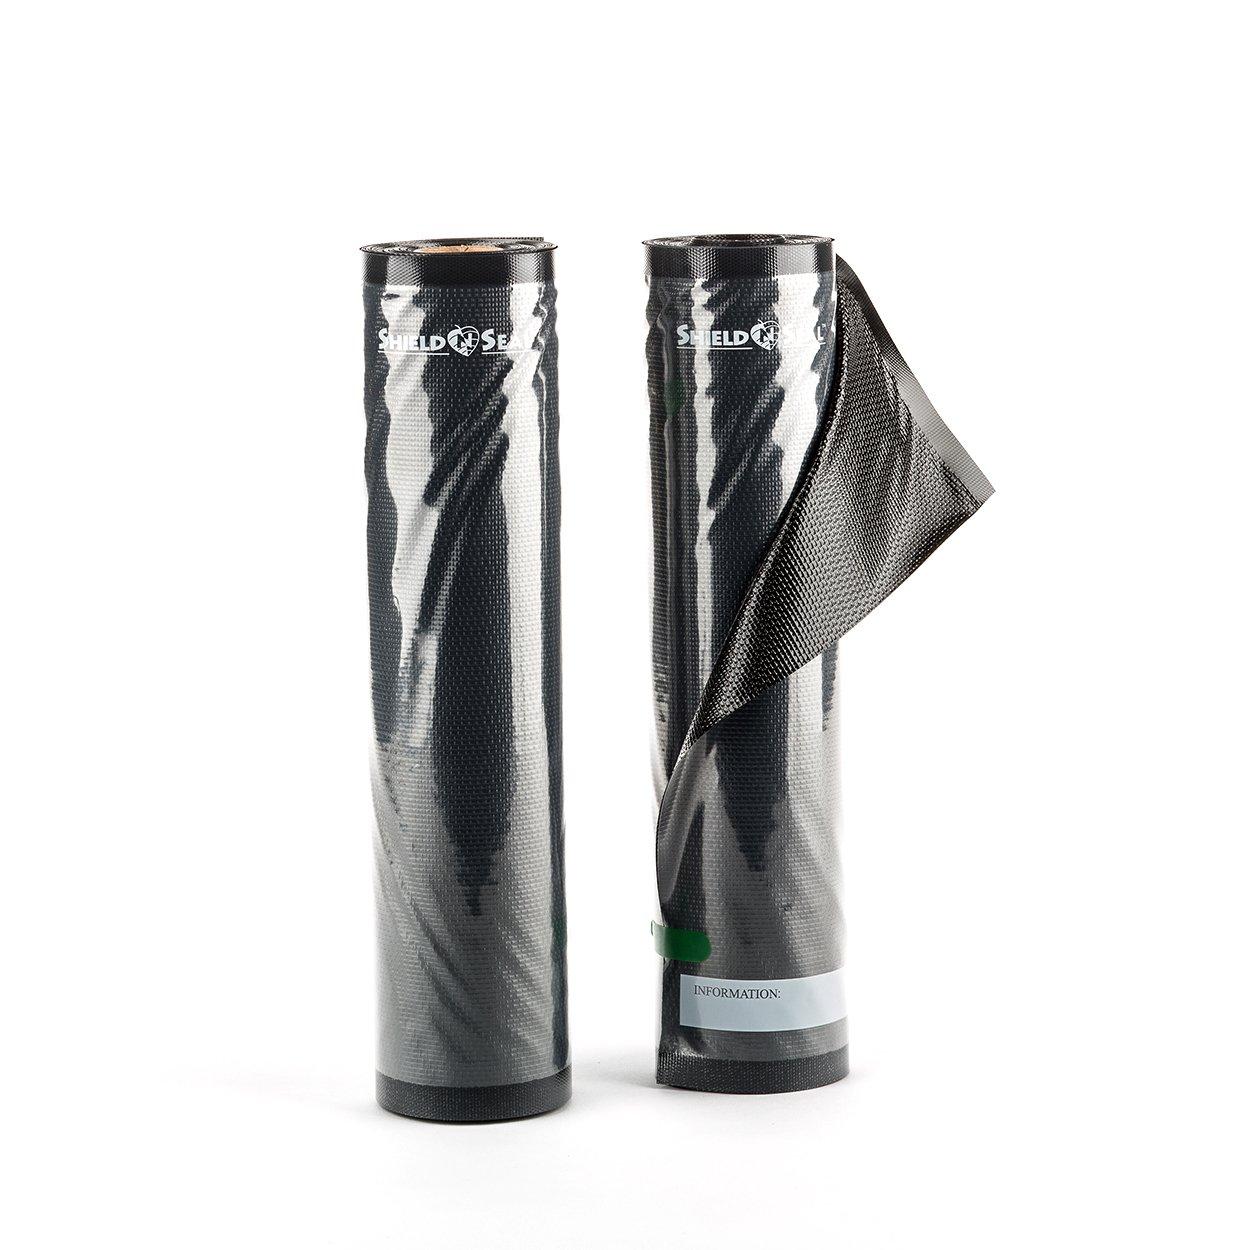 ShieldNSeal 11'' x 19.5' Clear & Black Vacuum Sealer Rolls SNS100 Food Storage Saver Heavy-Duty Bags Sous Vide by ShieldNSeal